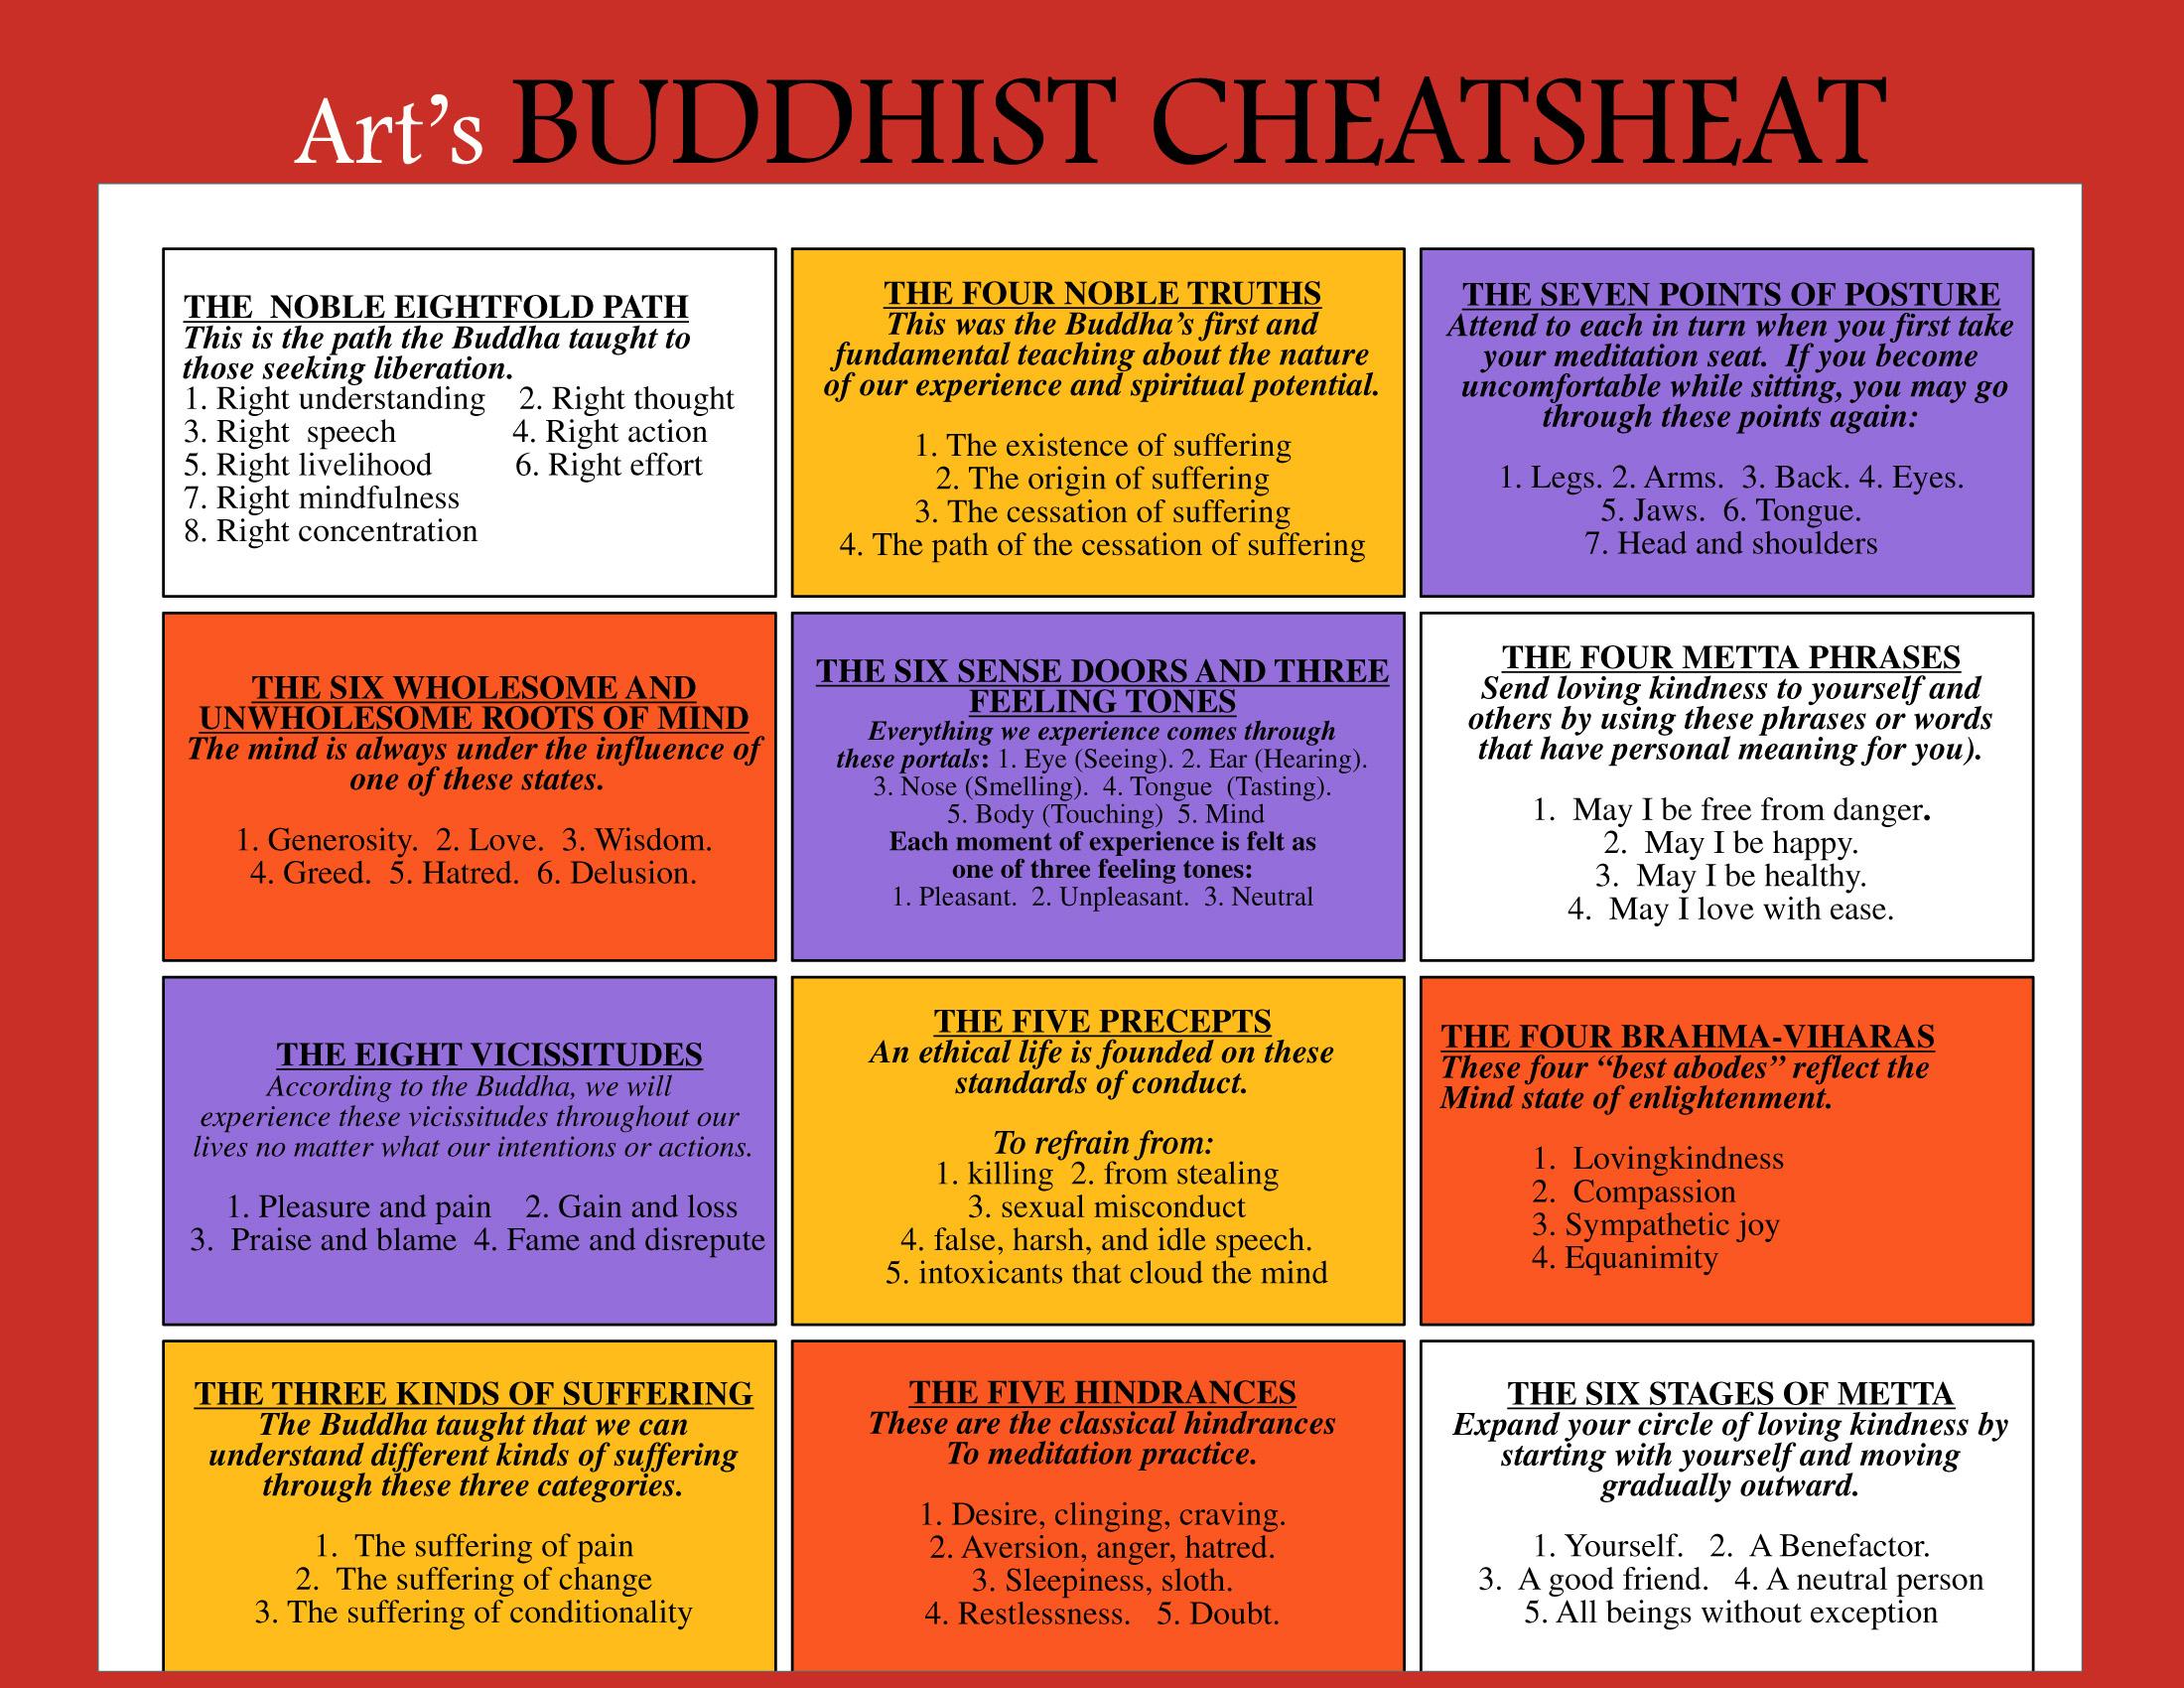 buddhist-cheatsheet